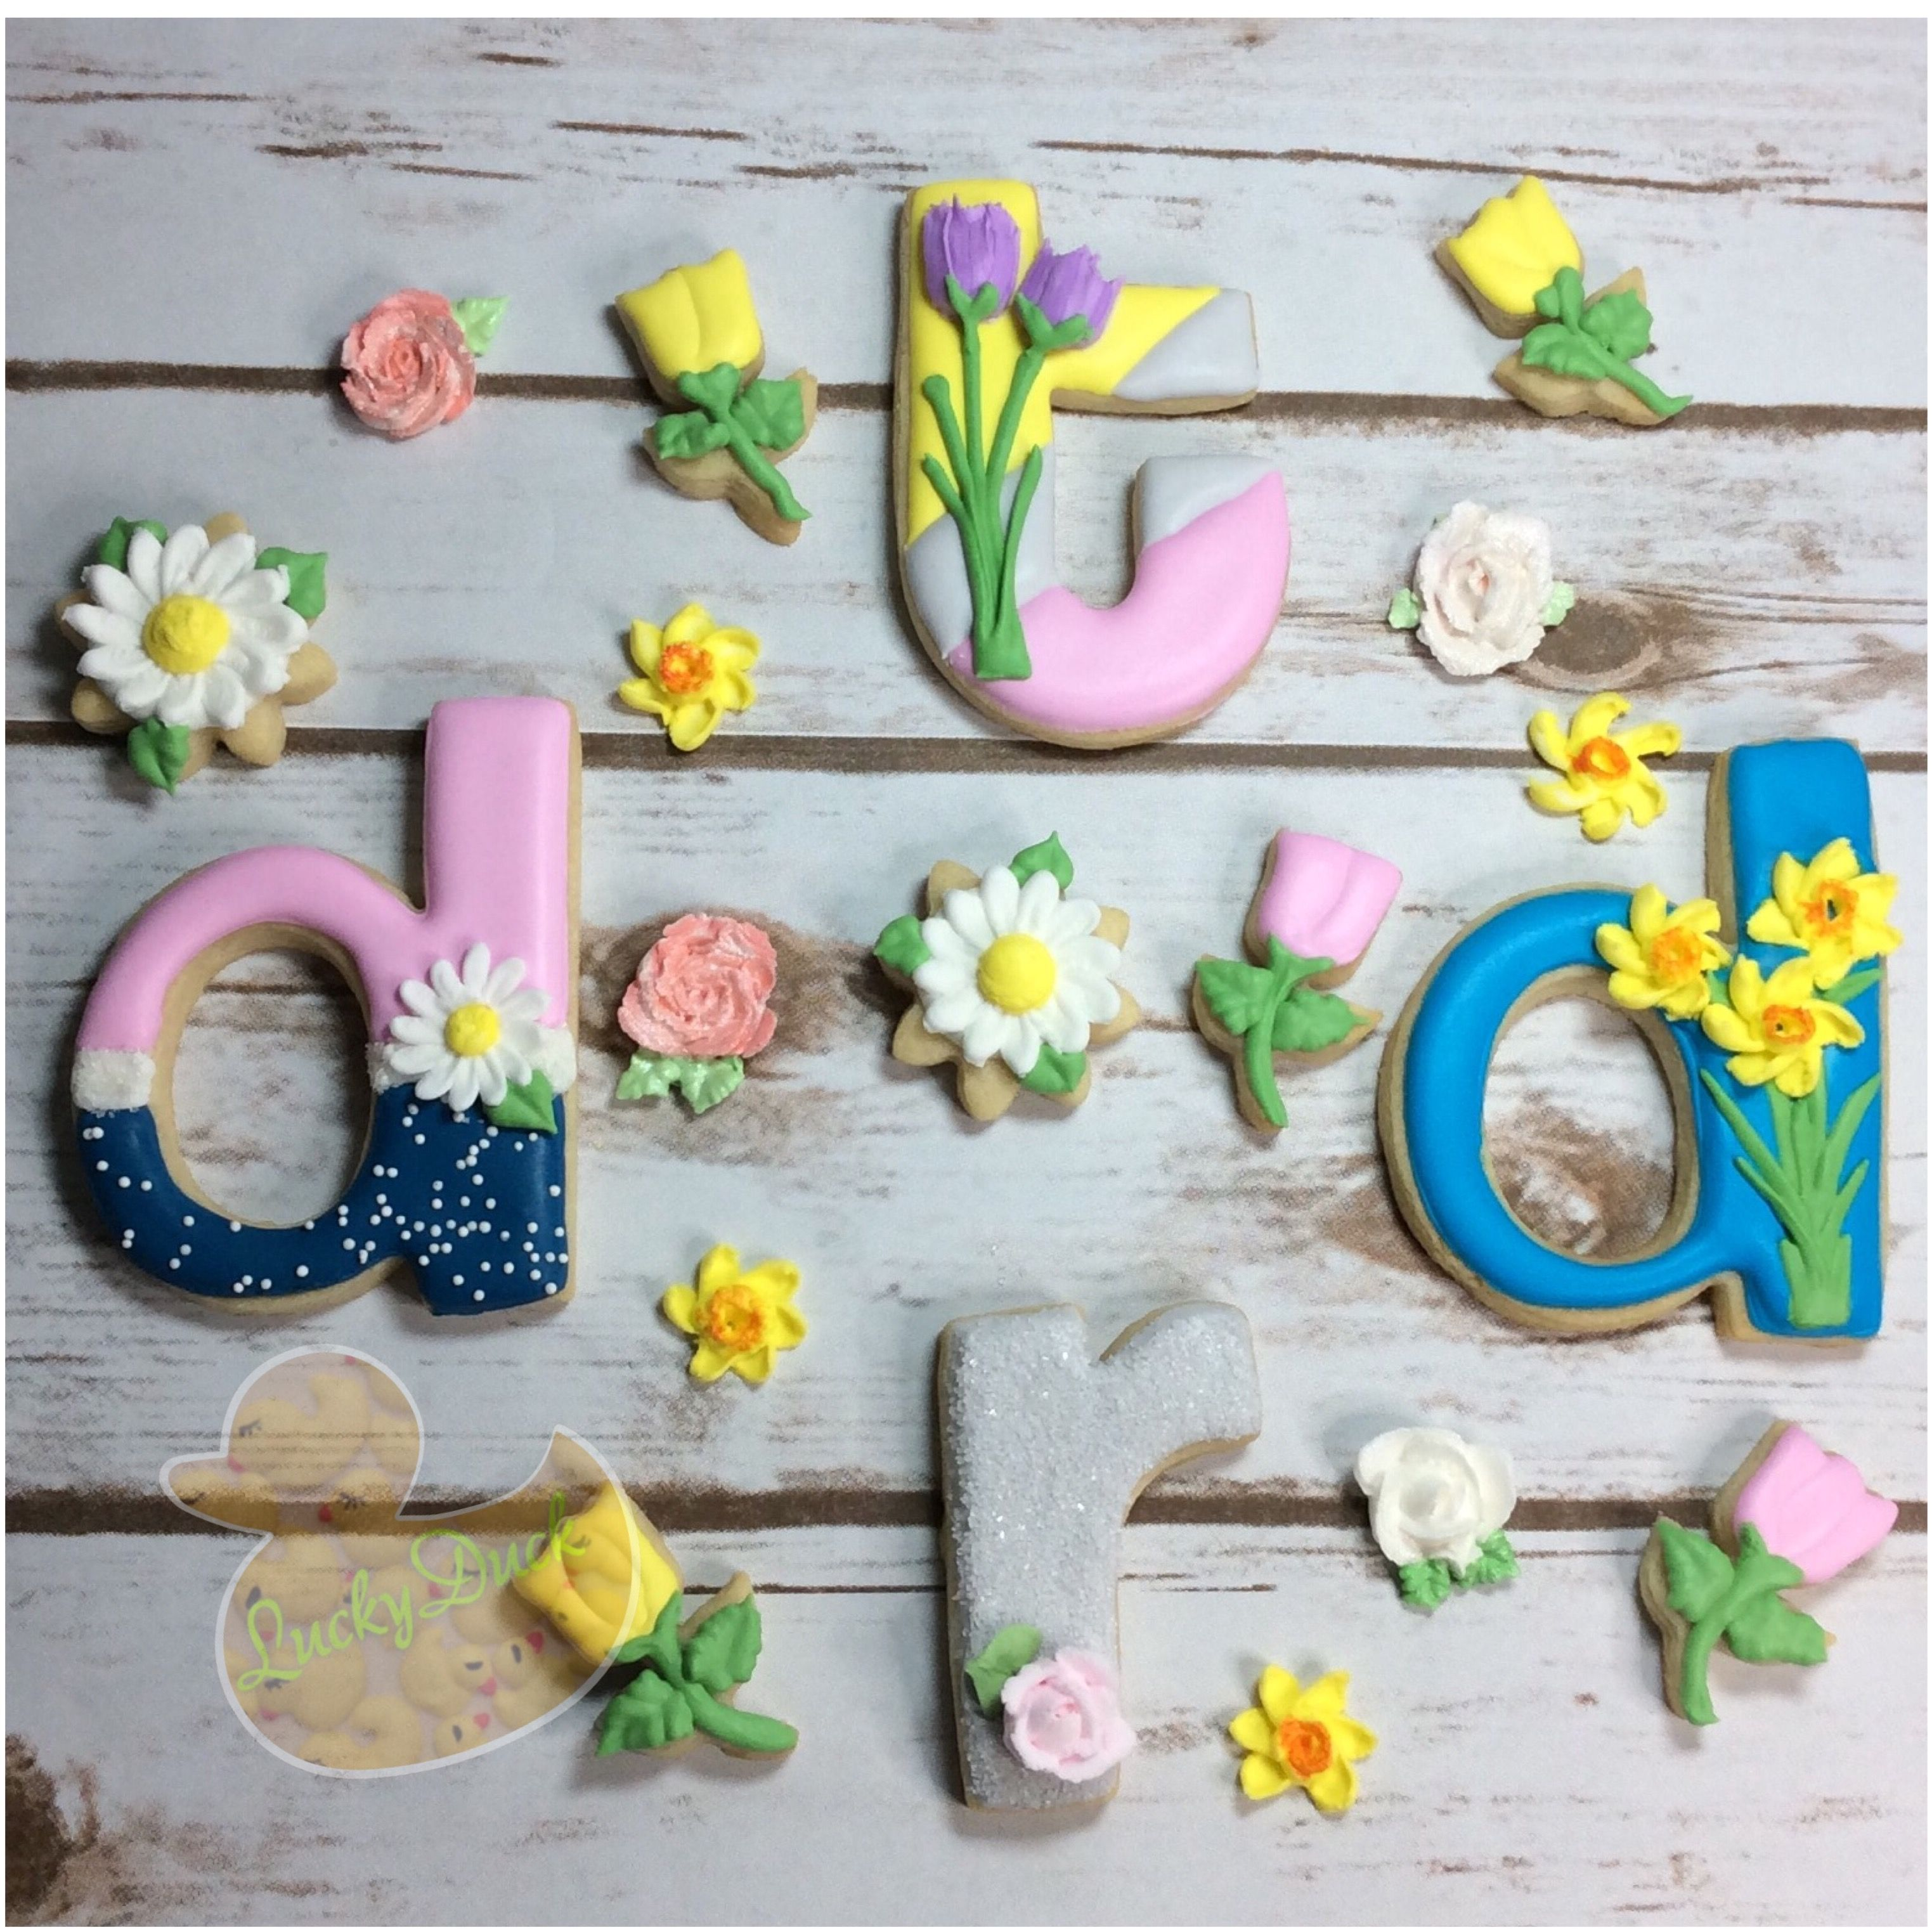 Helvetica lowercase cookie cutters Spring flowers daisy cookies